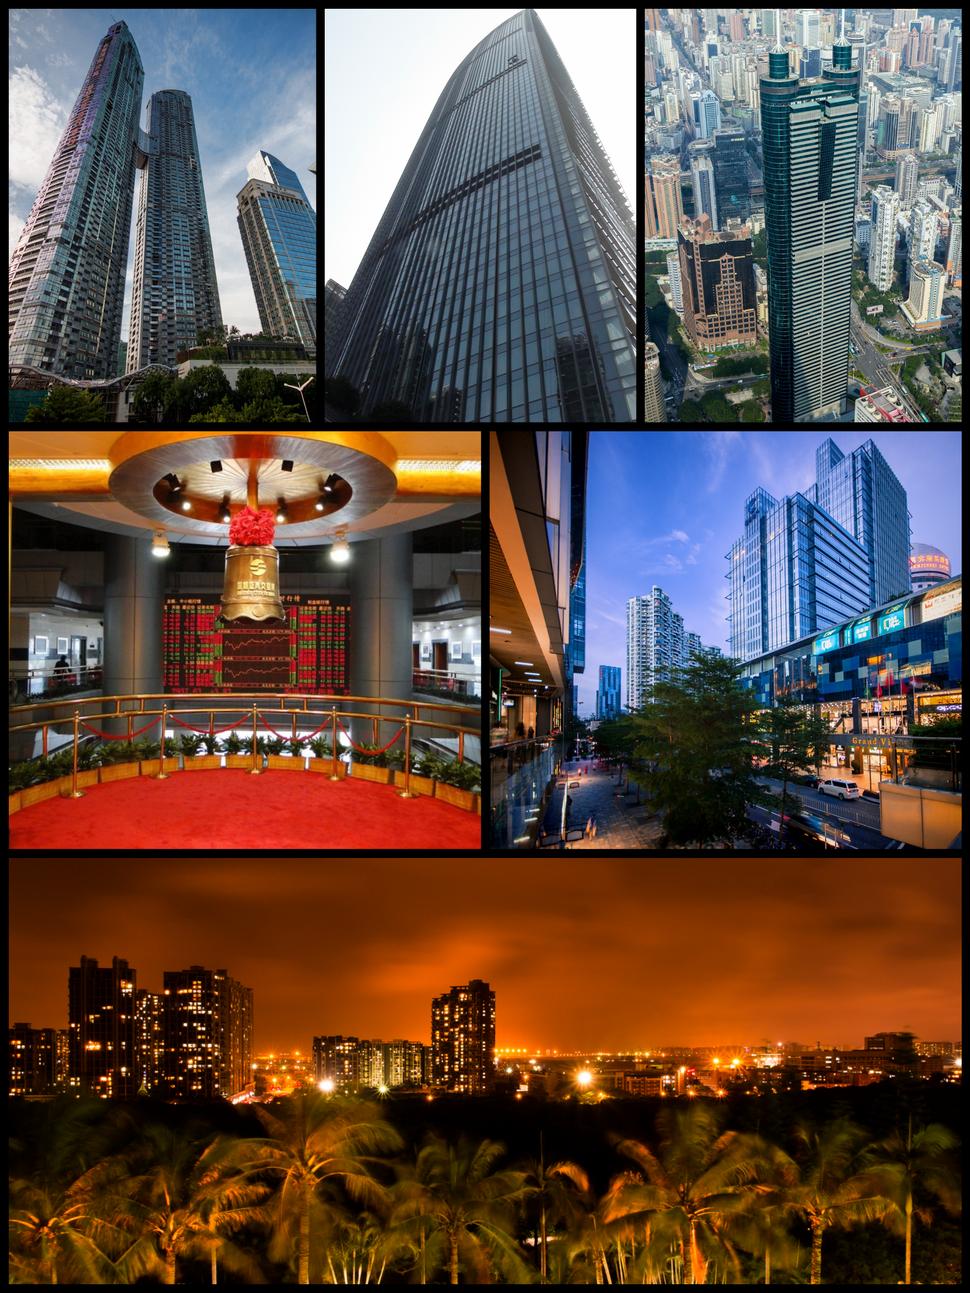 Clockwise starting at top left: East Pacific Center, KK100, Shun Hing Square, Coastal City, Shenzhen Bay at night, Shenzhen Stock Exchange